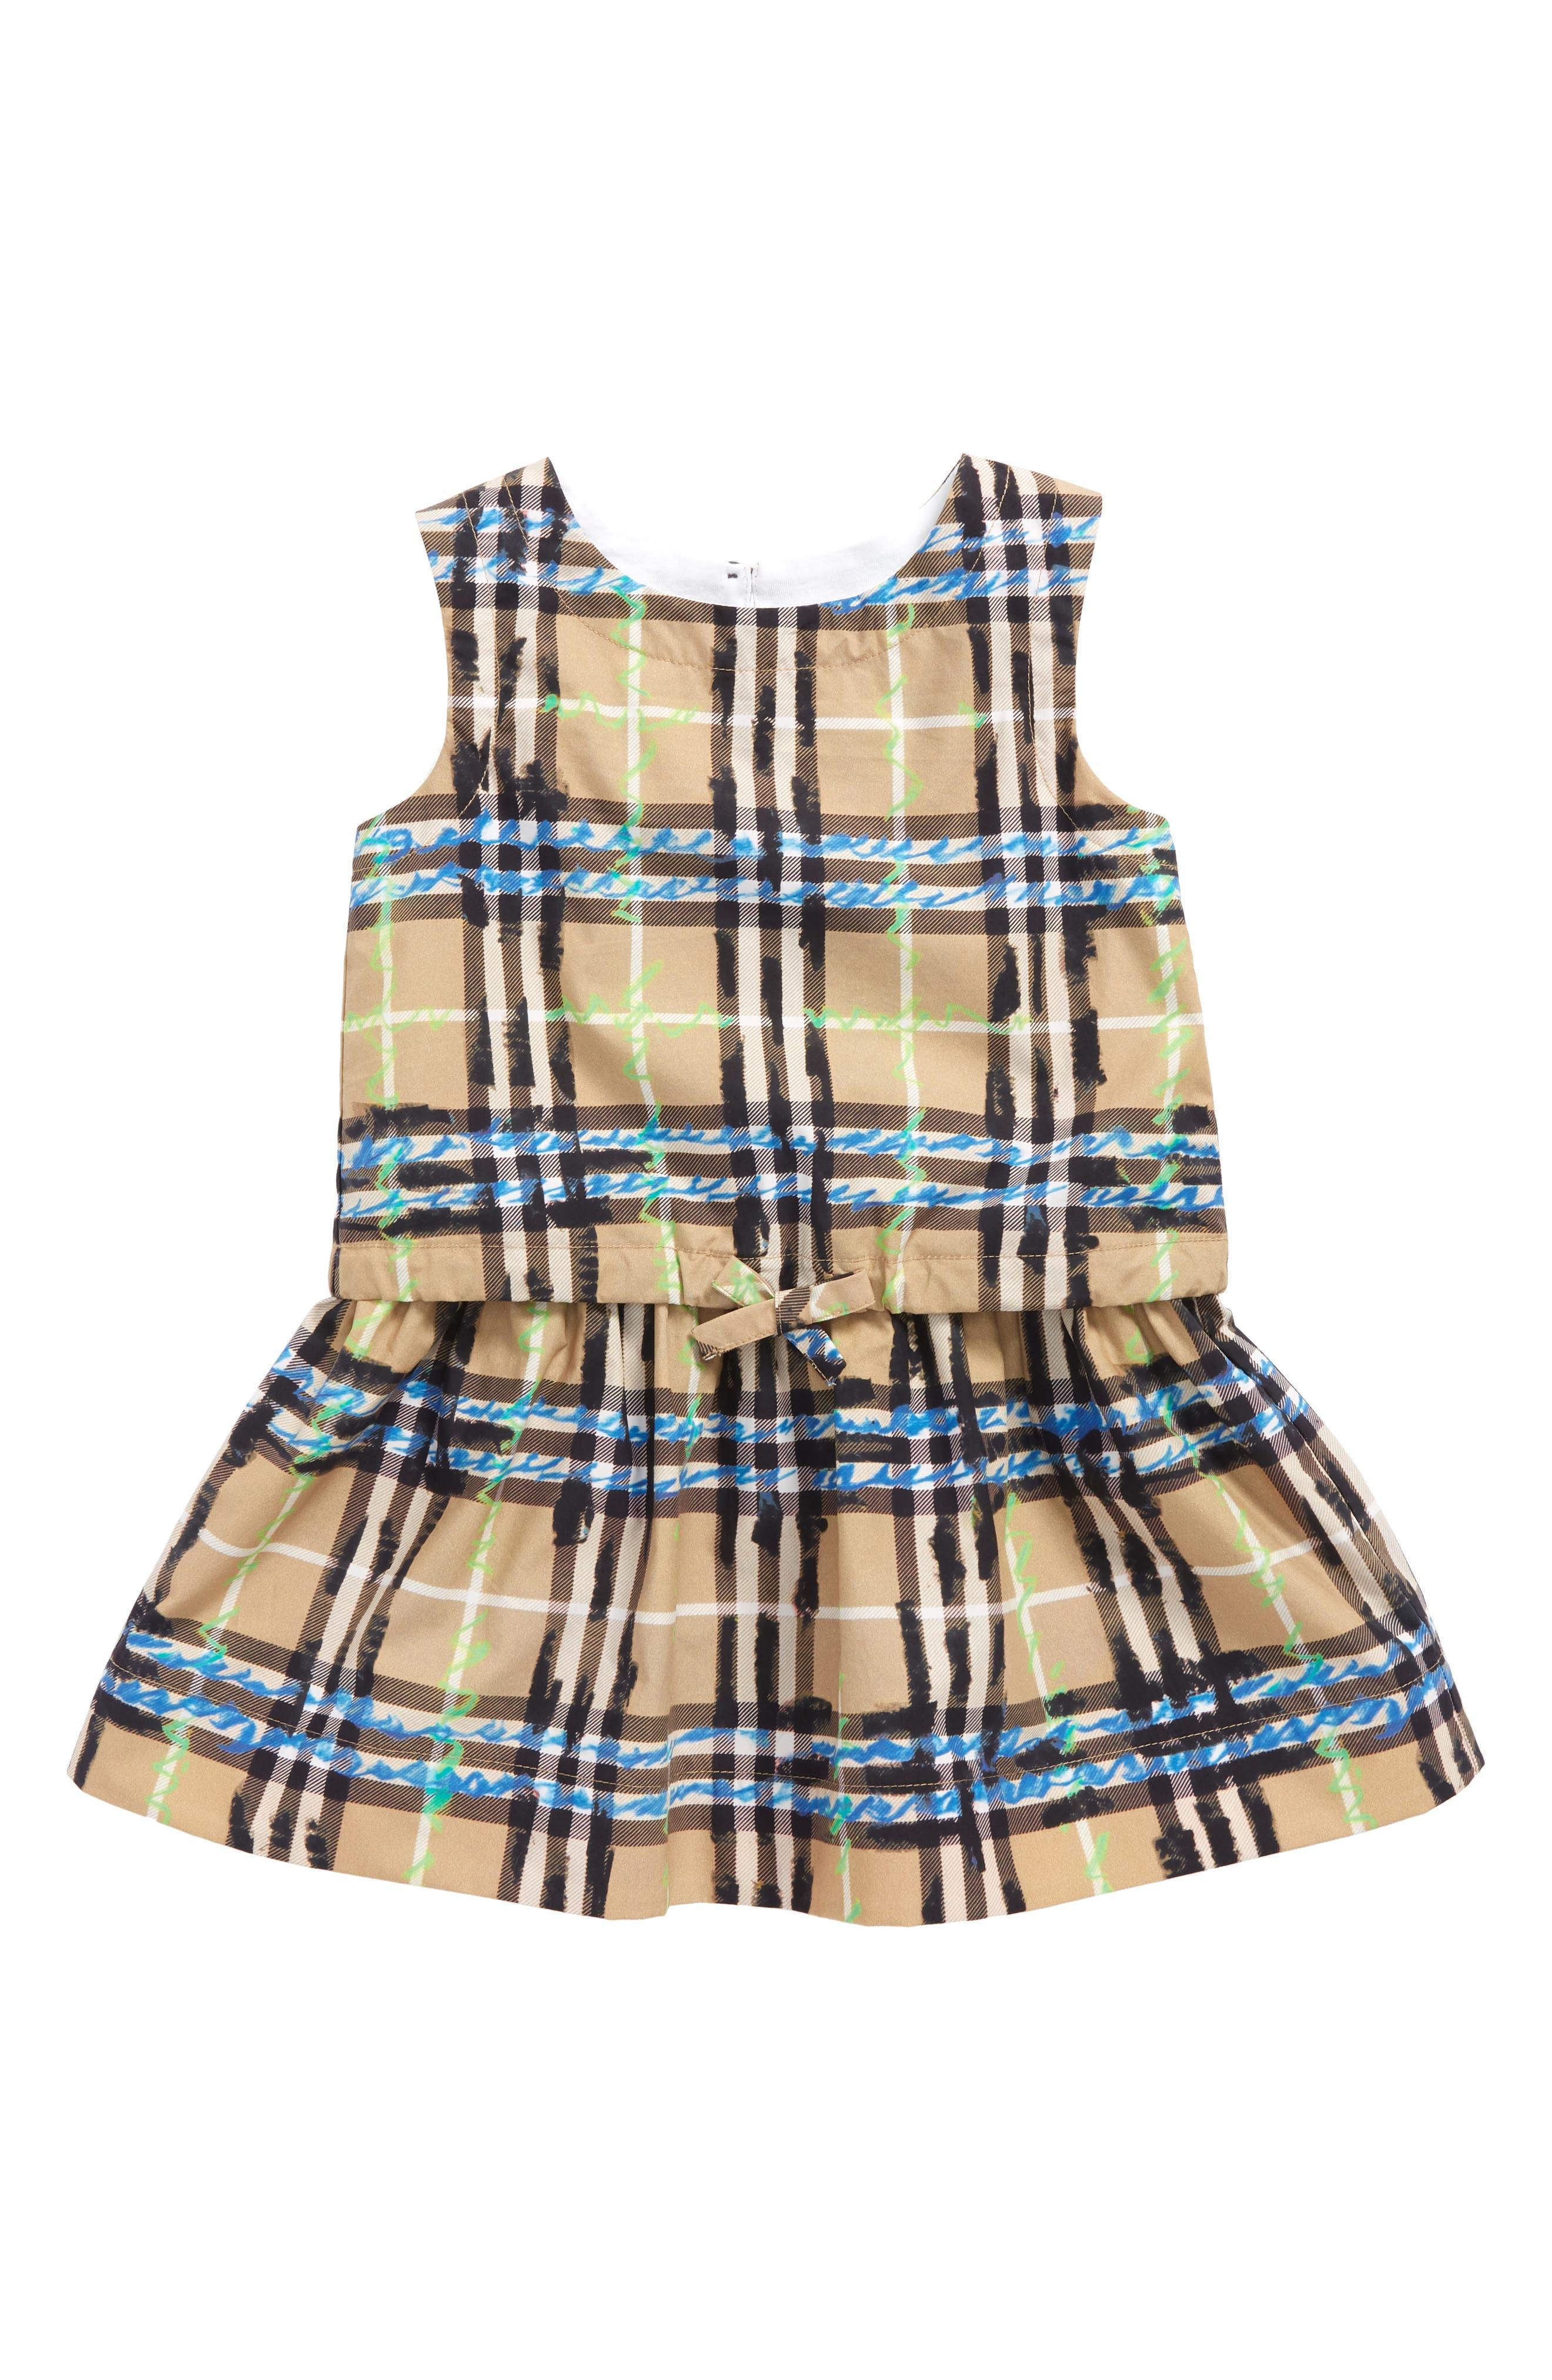 BURBERRY,                             Mabel Check Dress,                             Main thumbnail 1, color,                             431